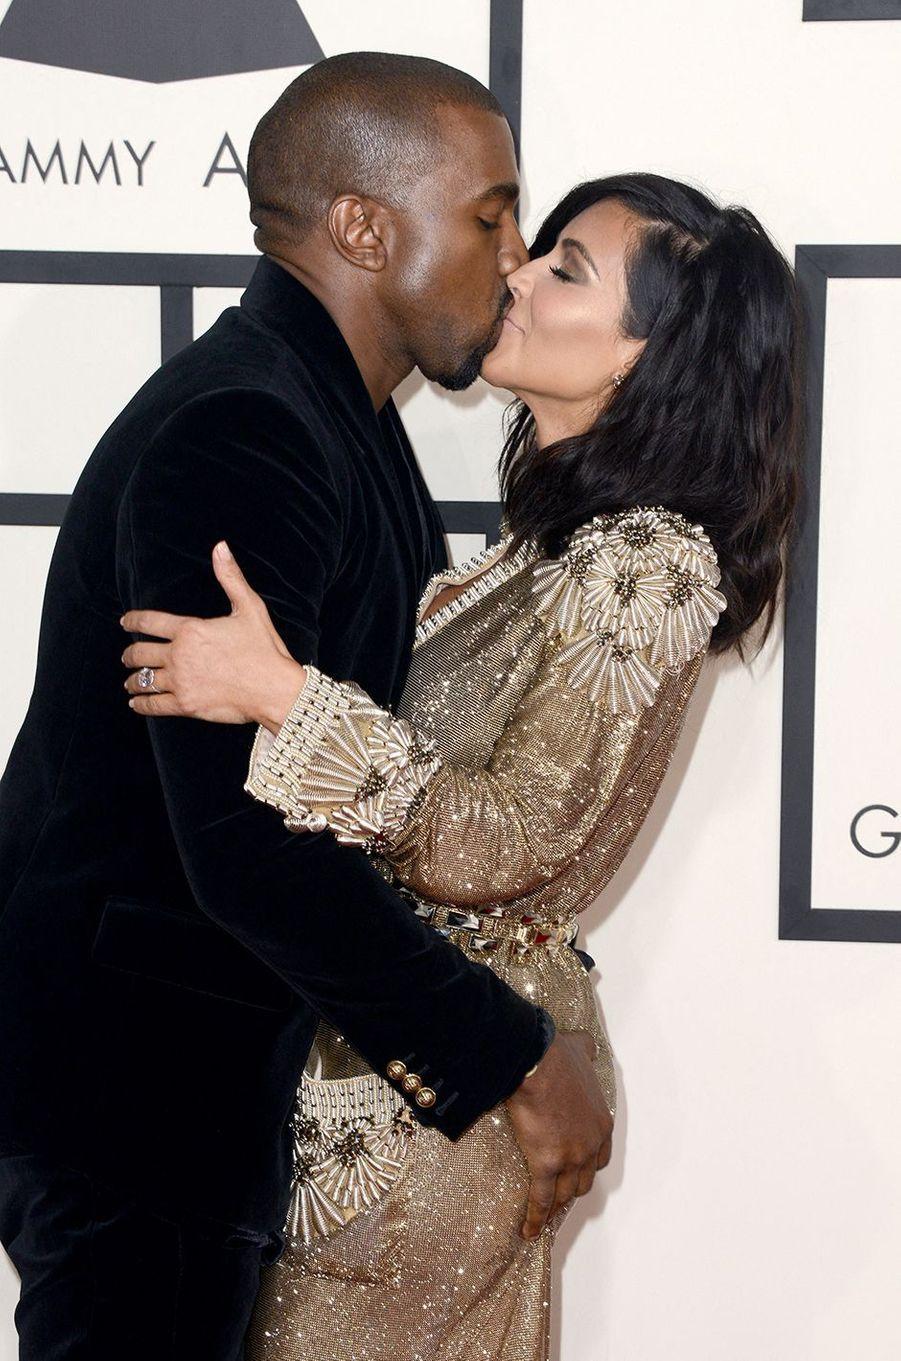 Kim Kardashian et Kanye West aux Grammy Awards à Los Angeles en février 2015